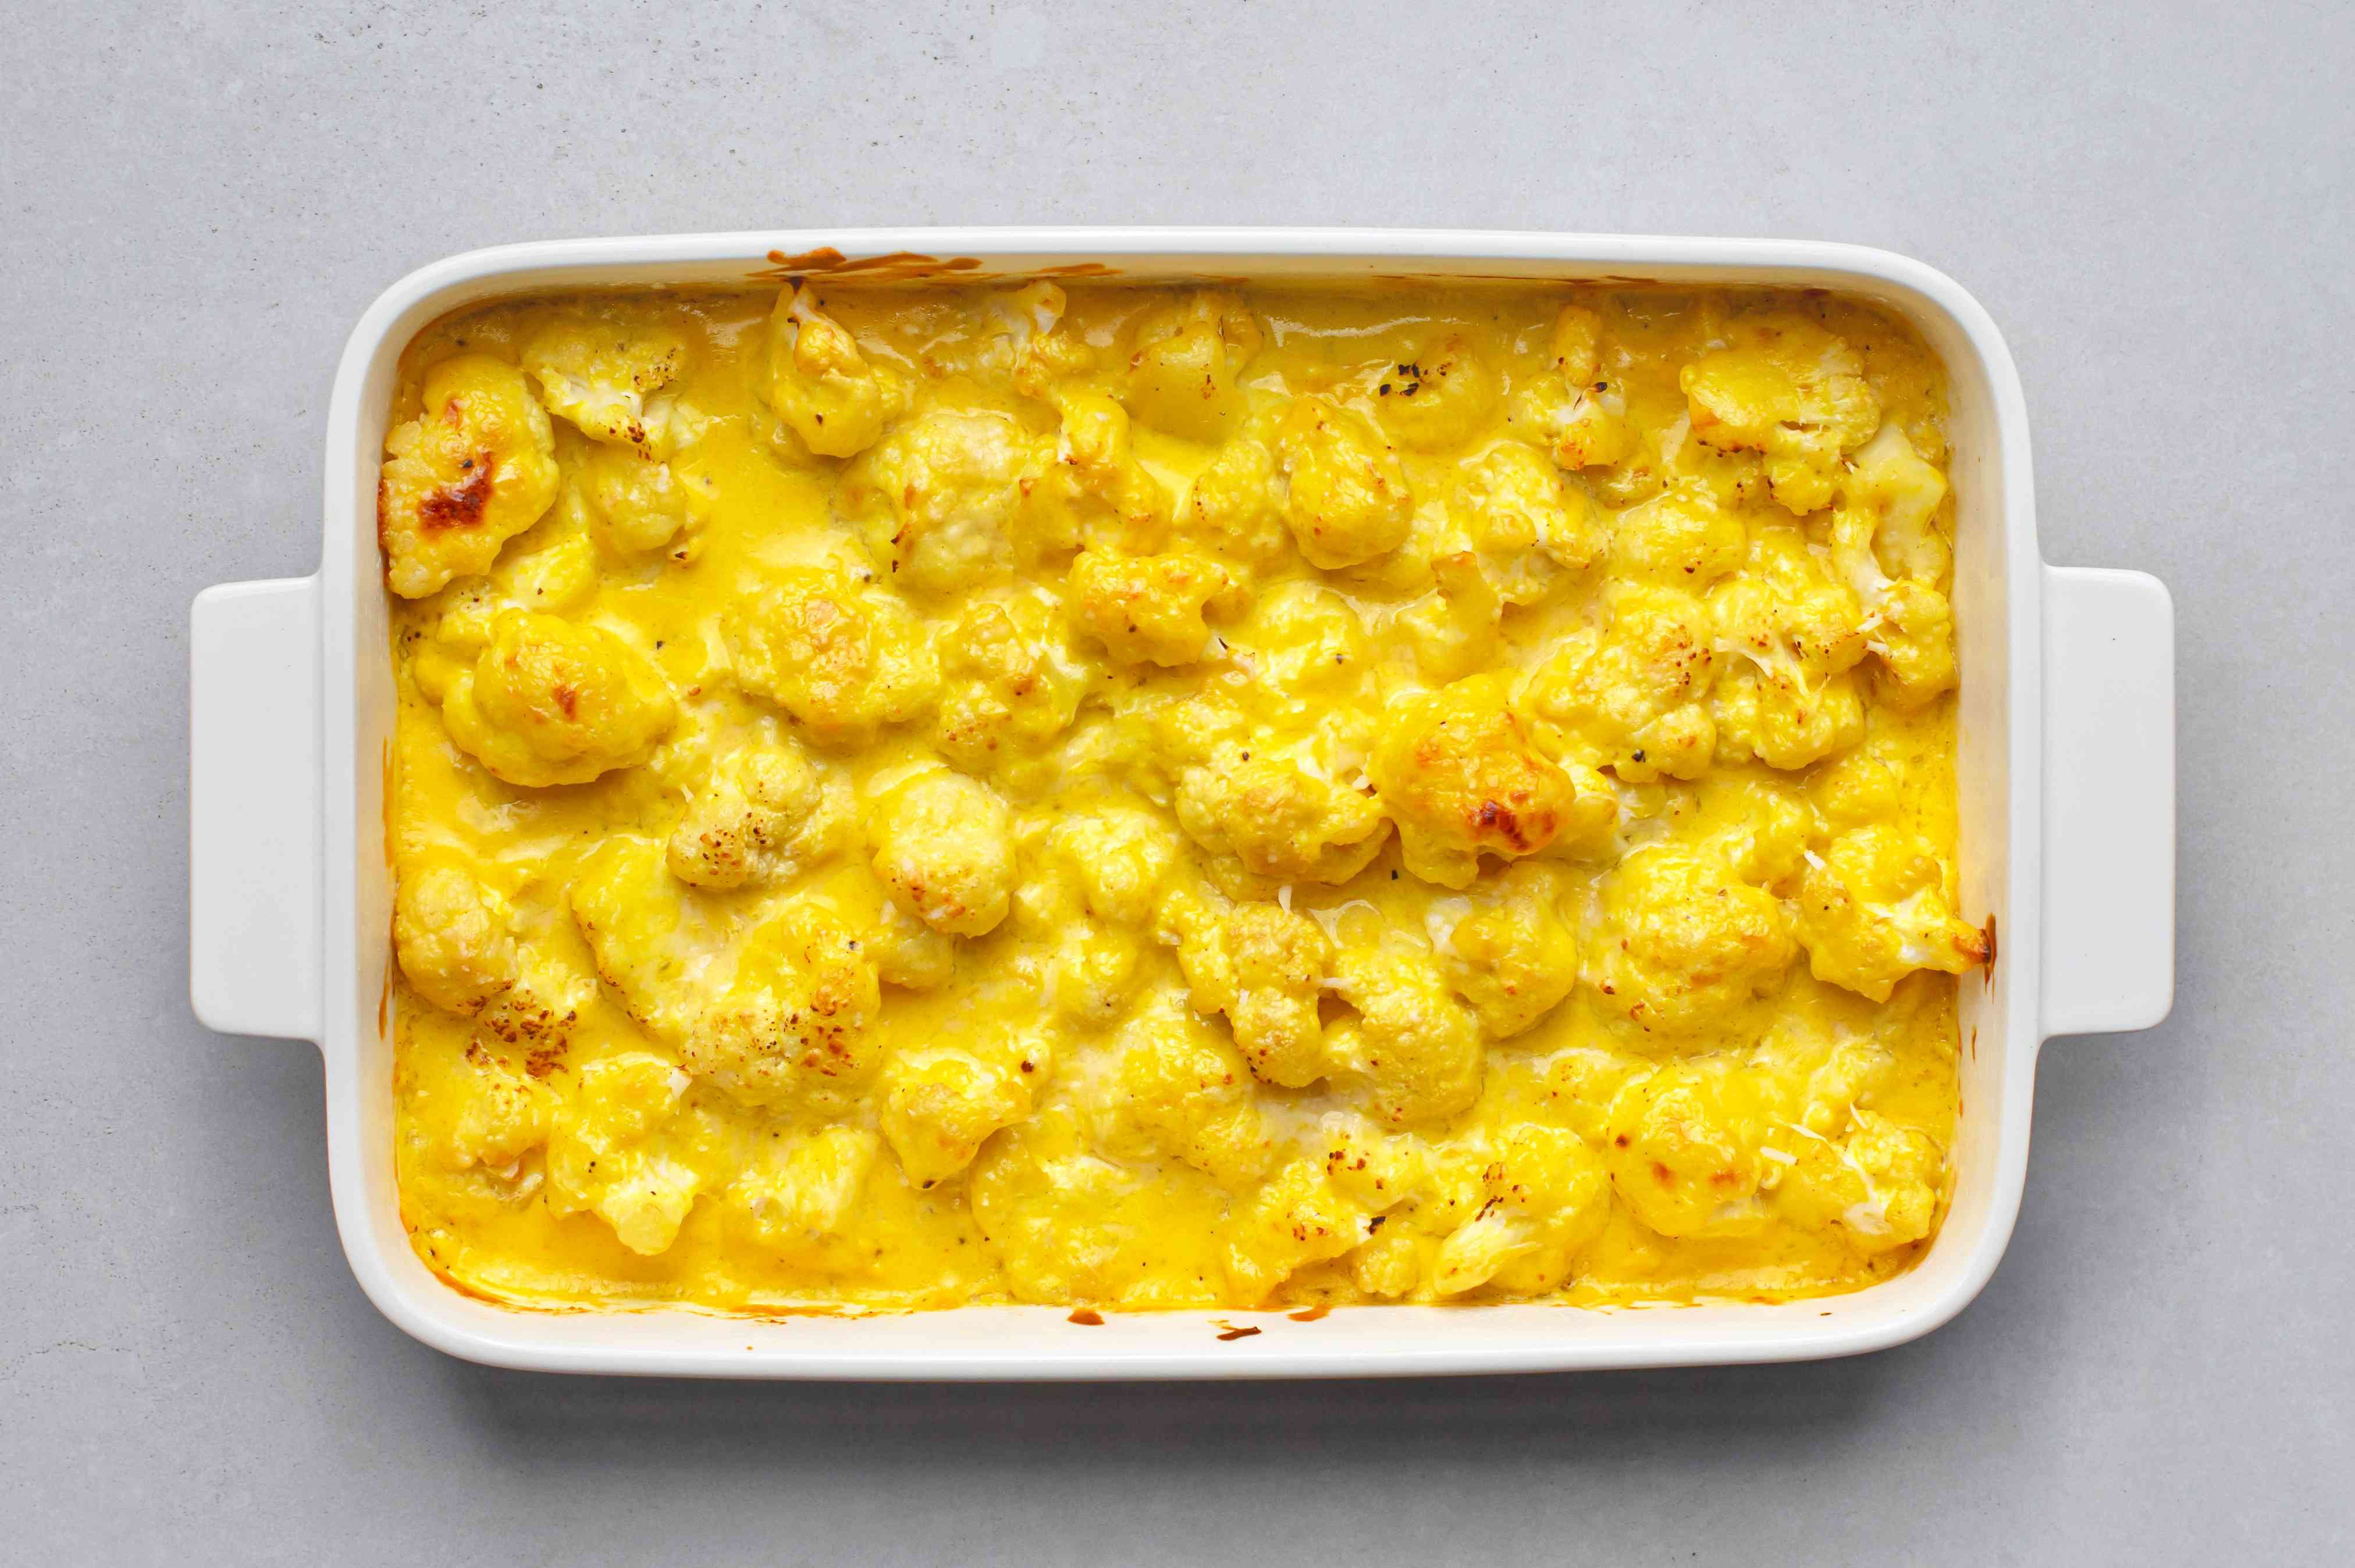 Cauliflower Mac and Cheese, in a baking dish